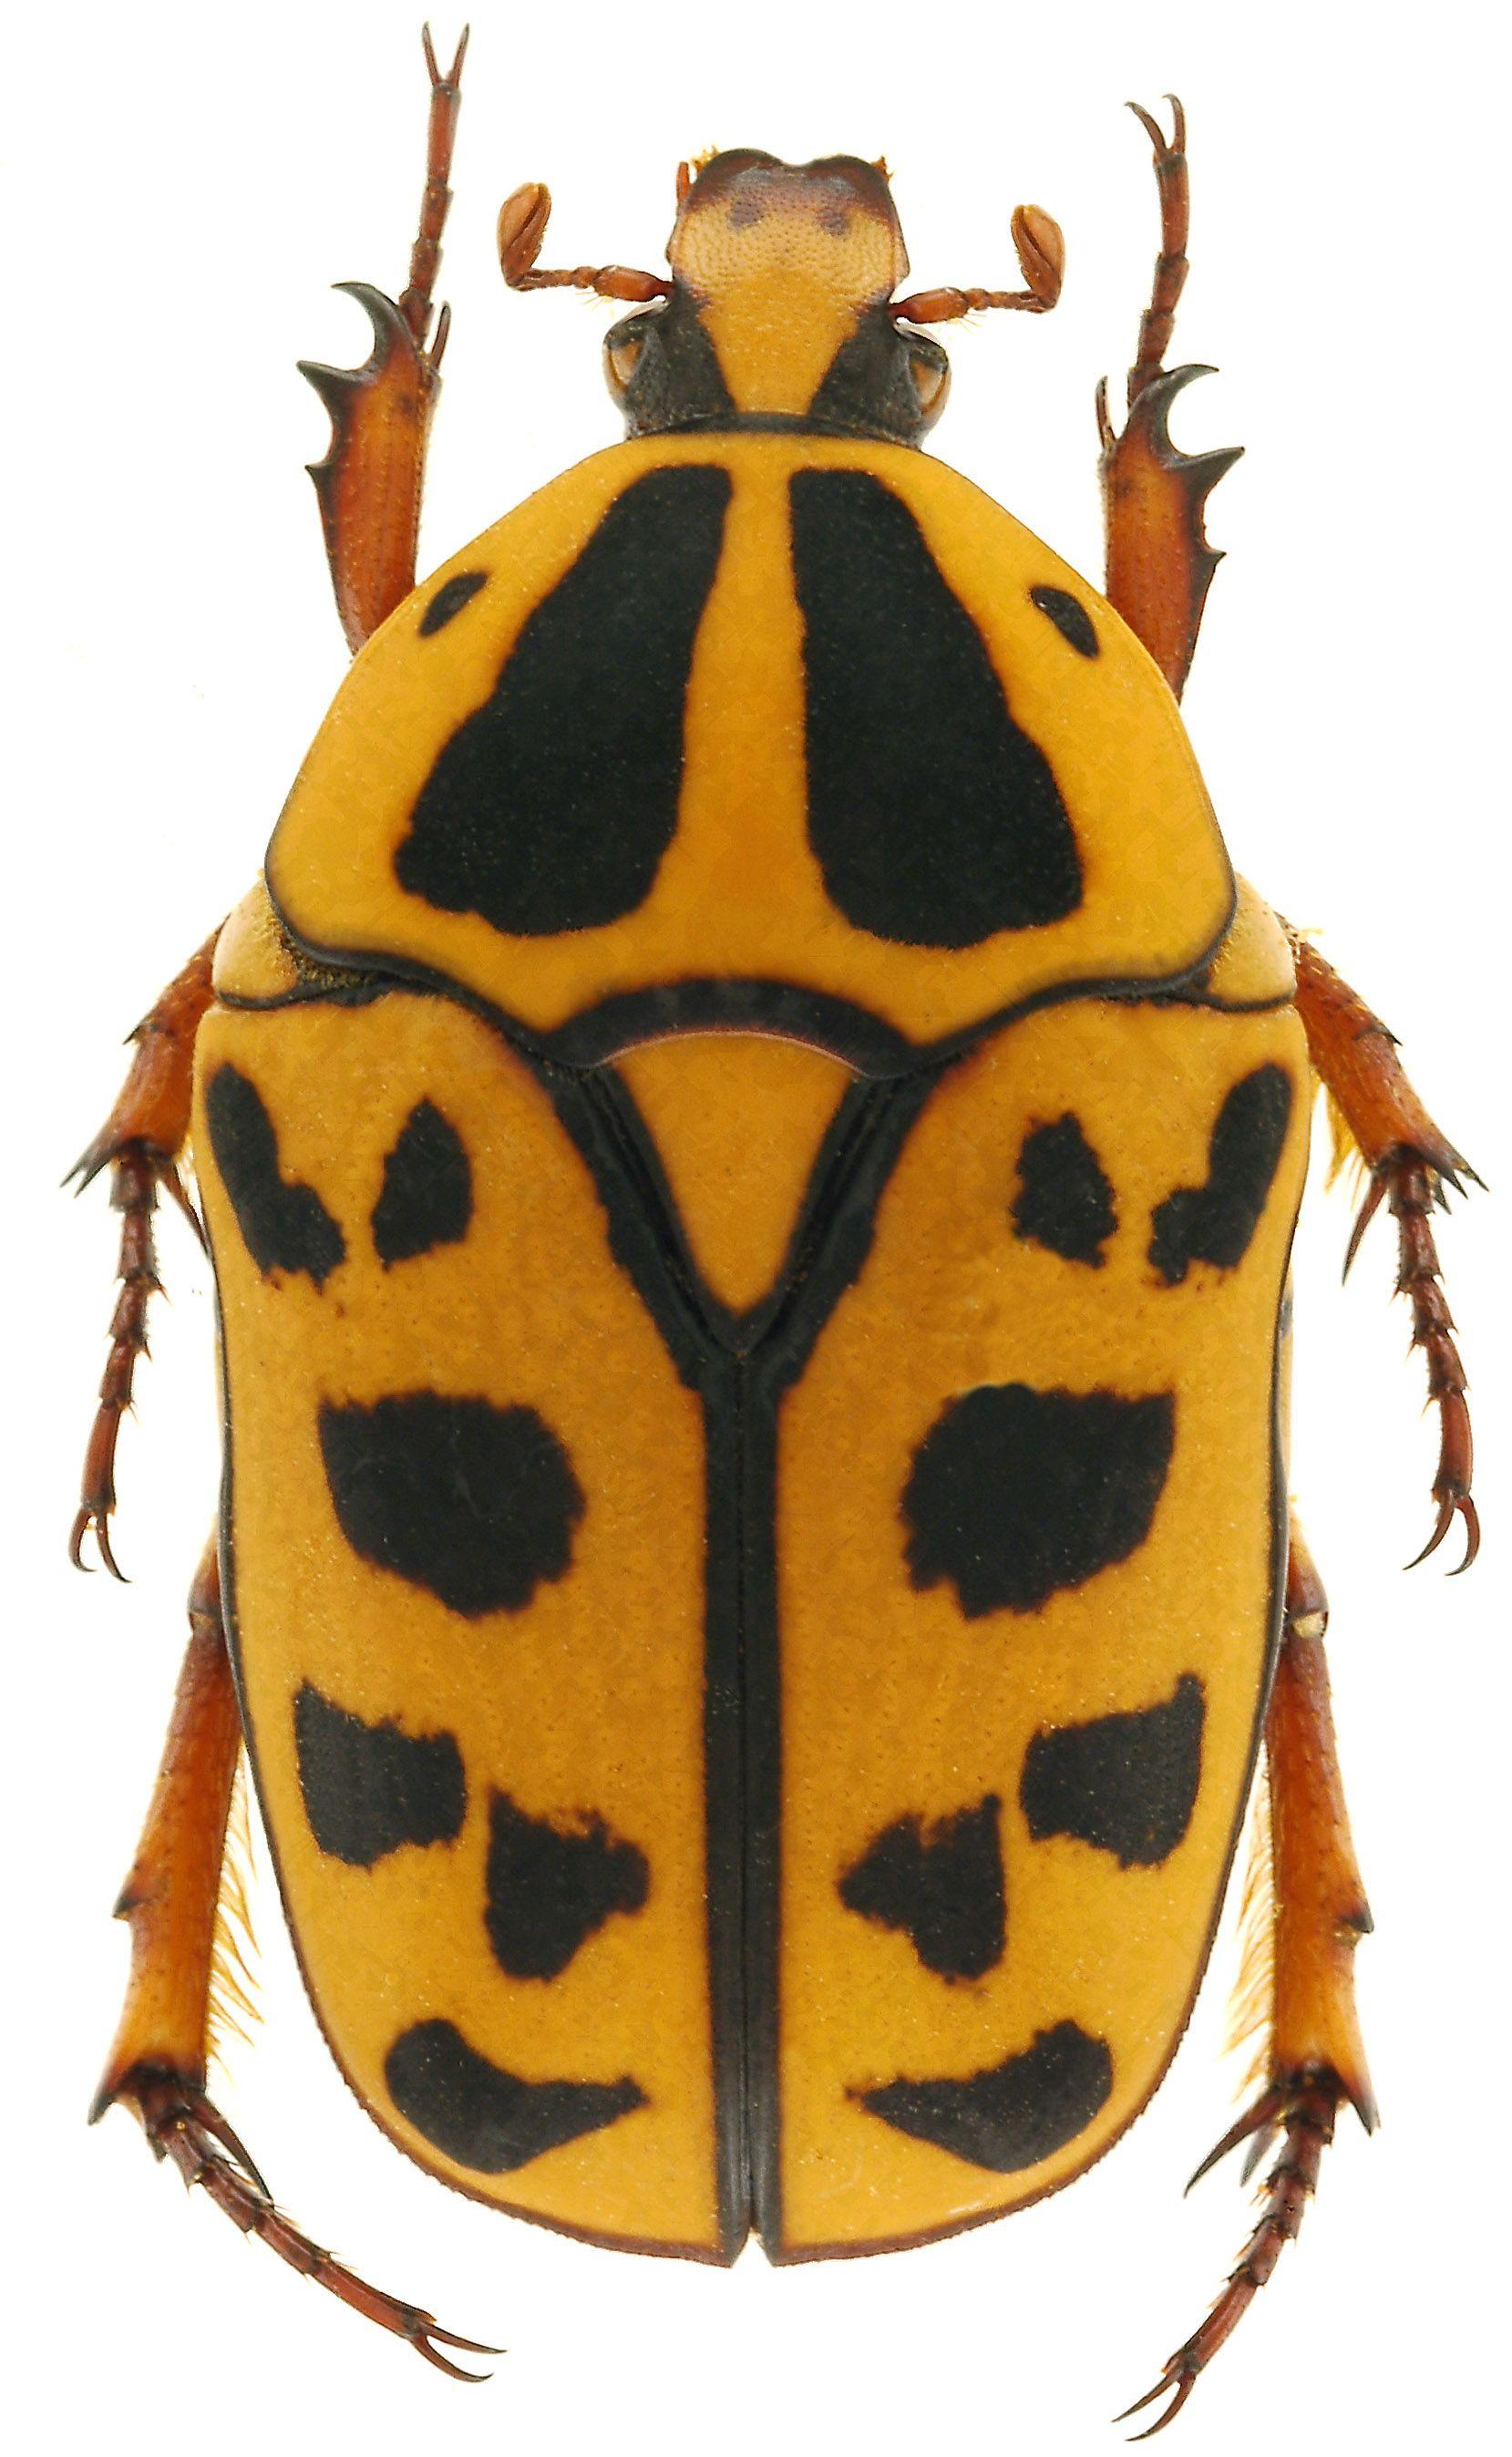 Pachnoda Cordata 画像あり 甲虫類 虫 ハナムグリ